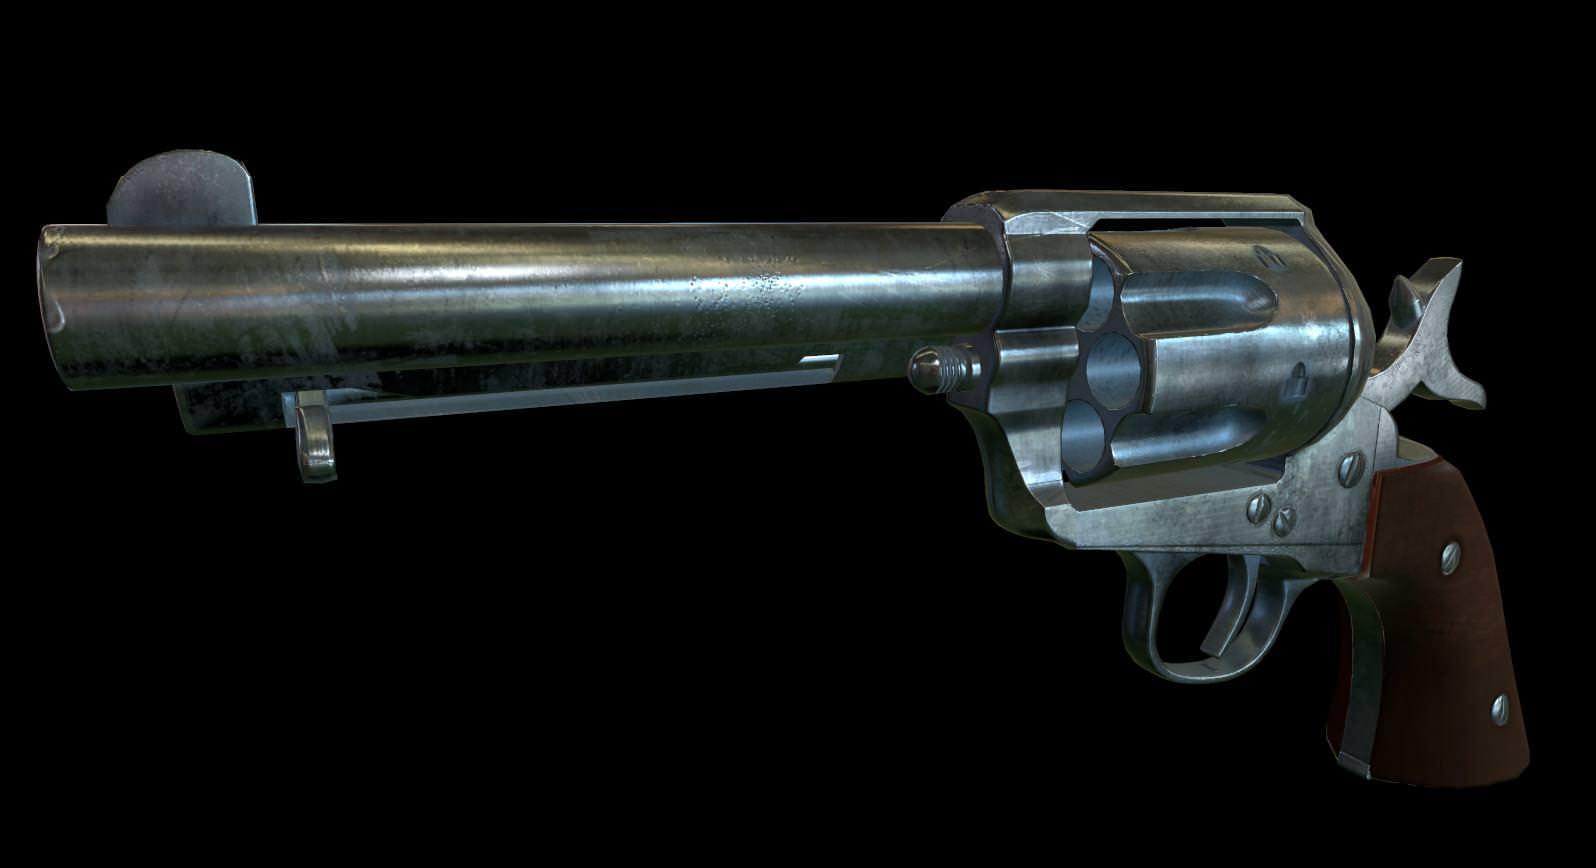 The new Colt SAA